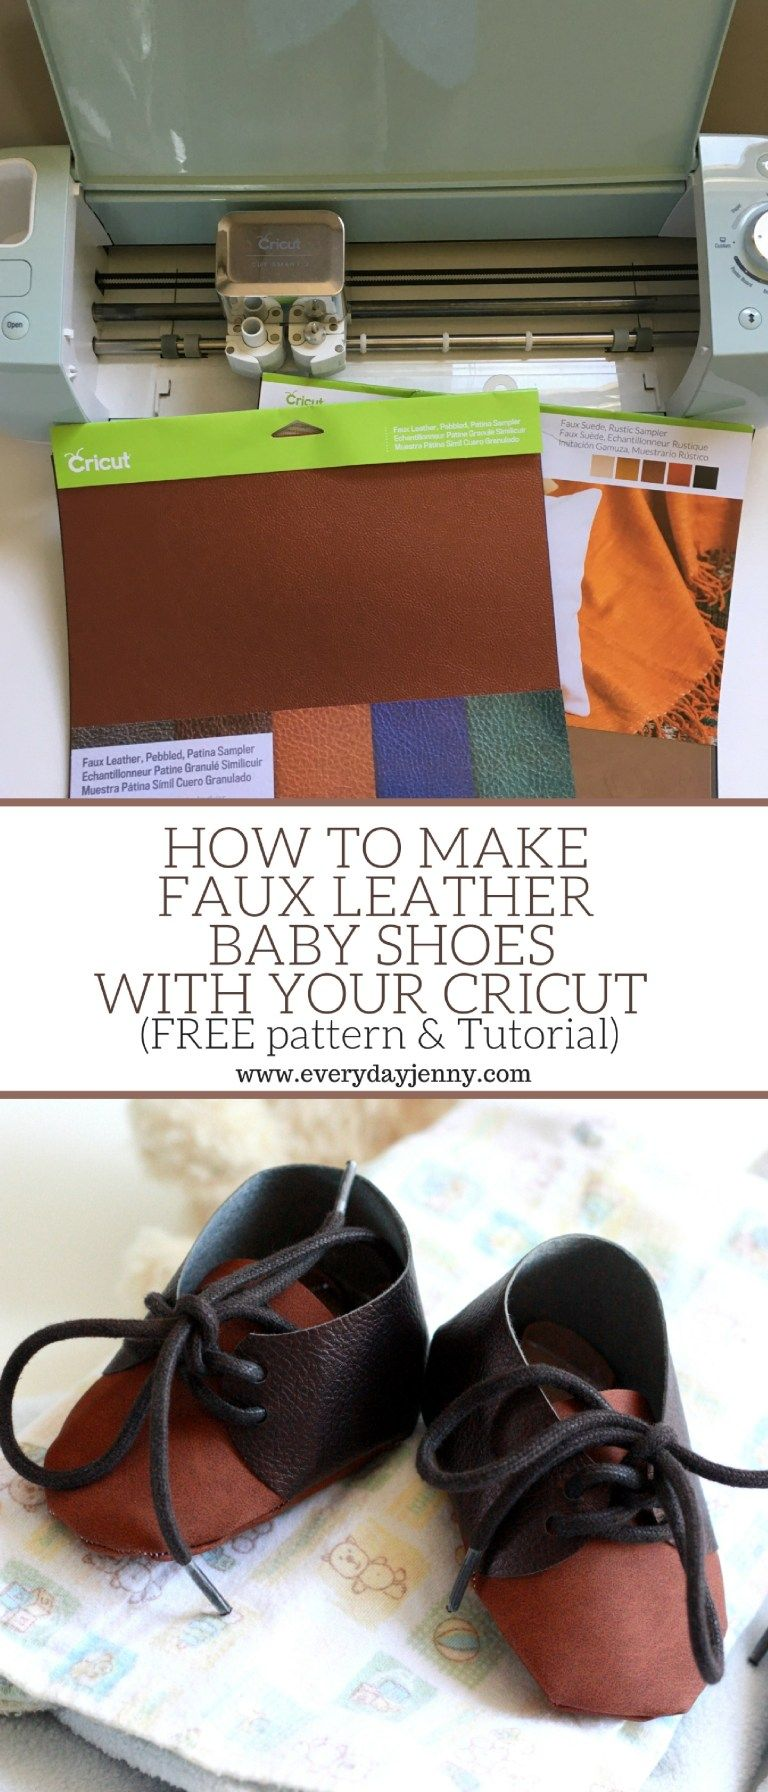 Cricut Pebbled Faux Leather Patina Sampler